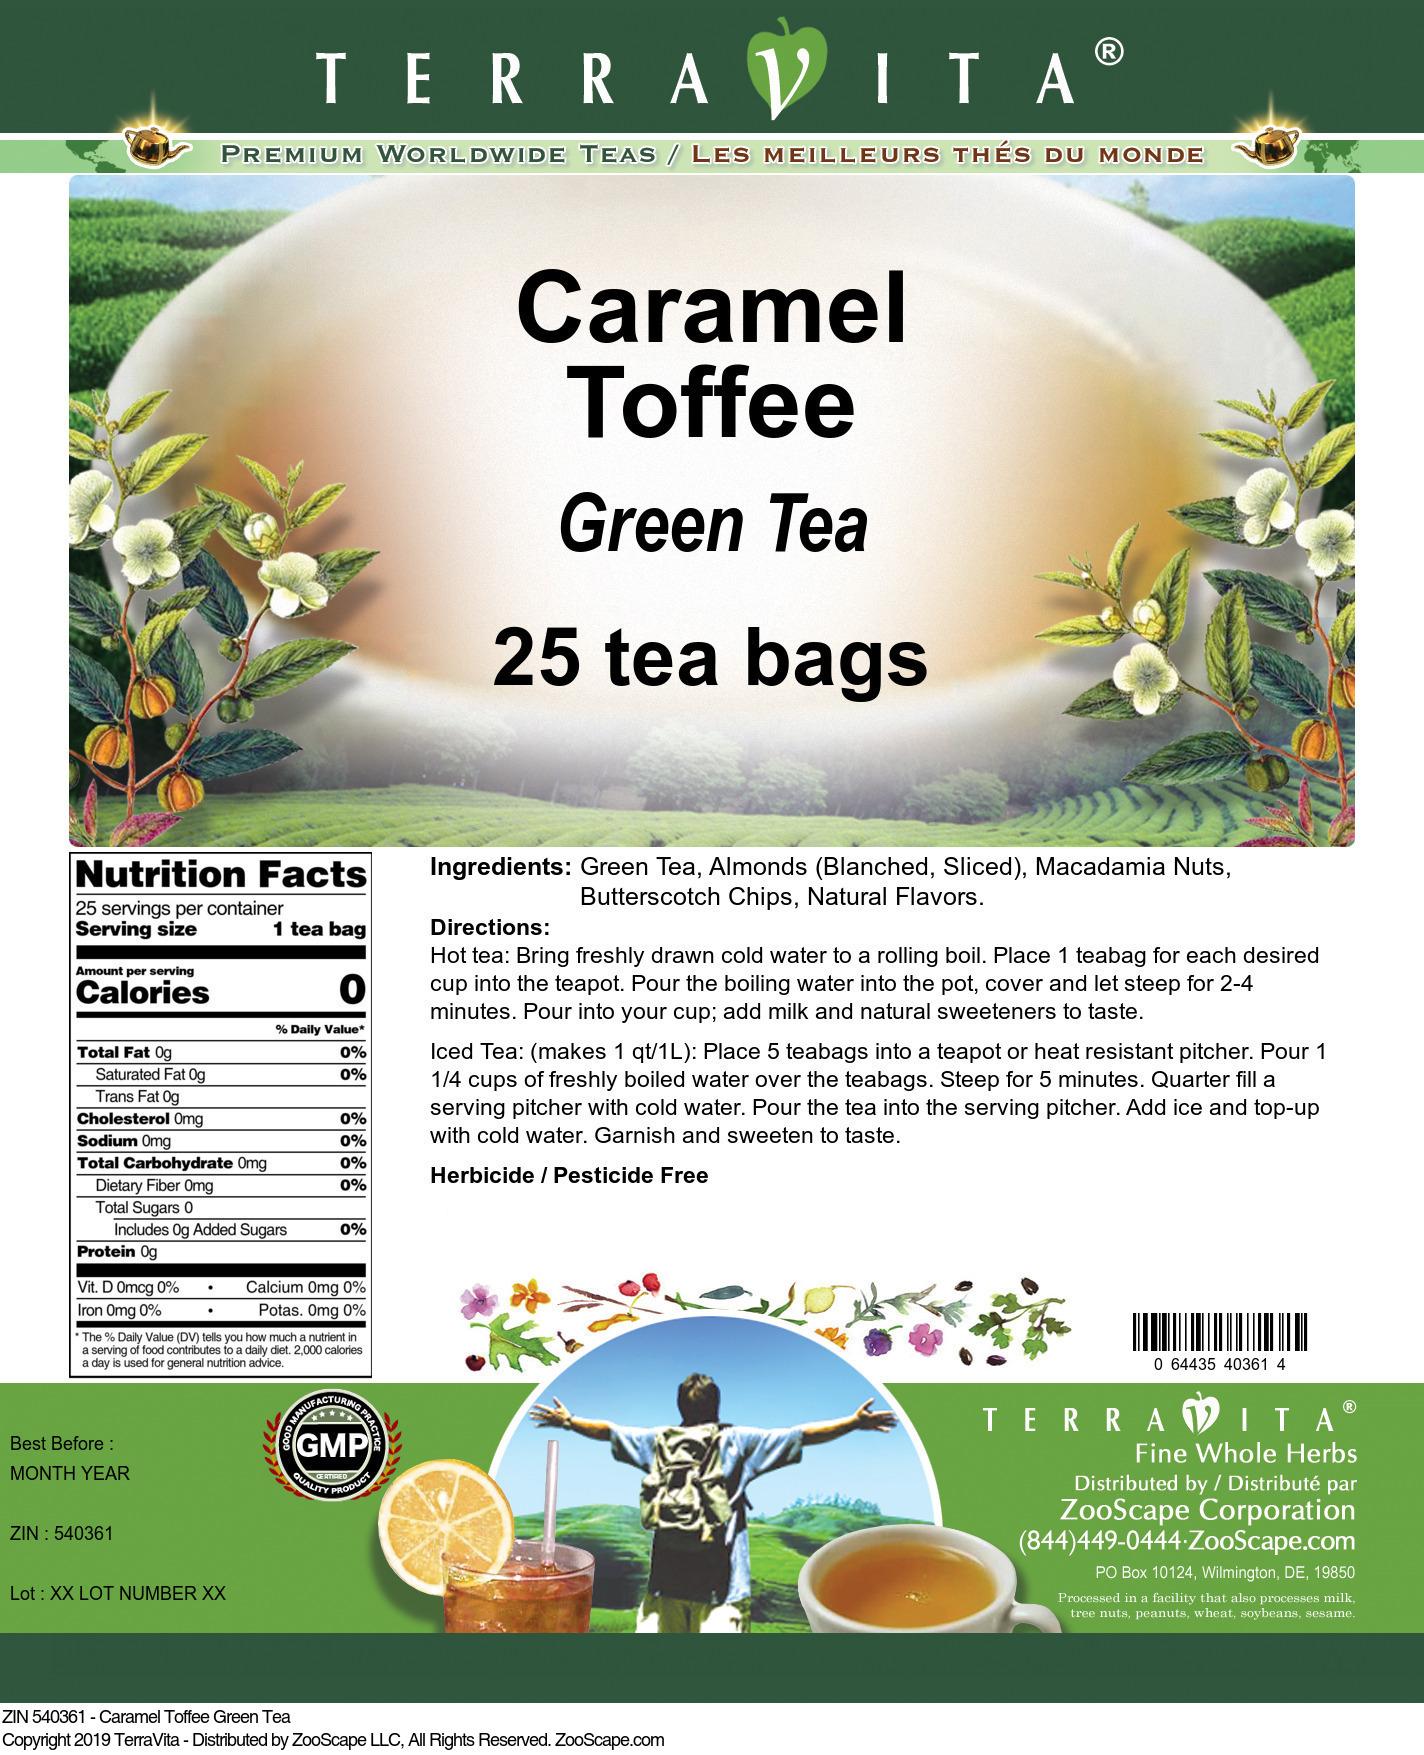 Caramel Toffee Green Tea